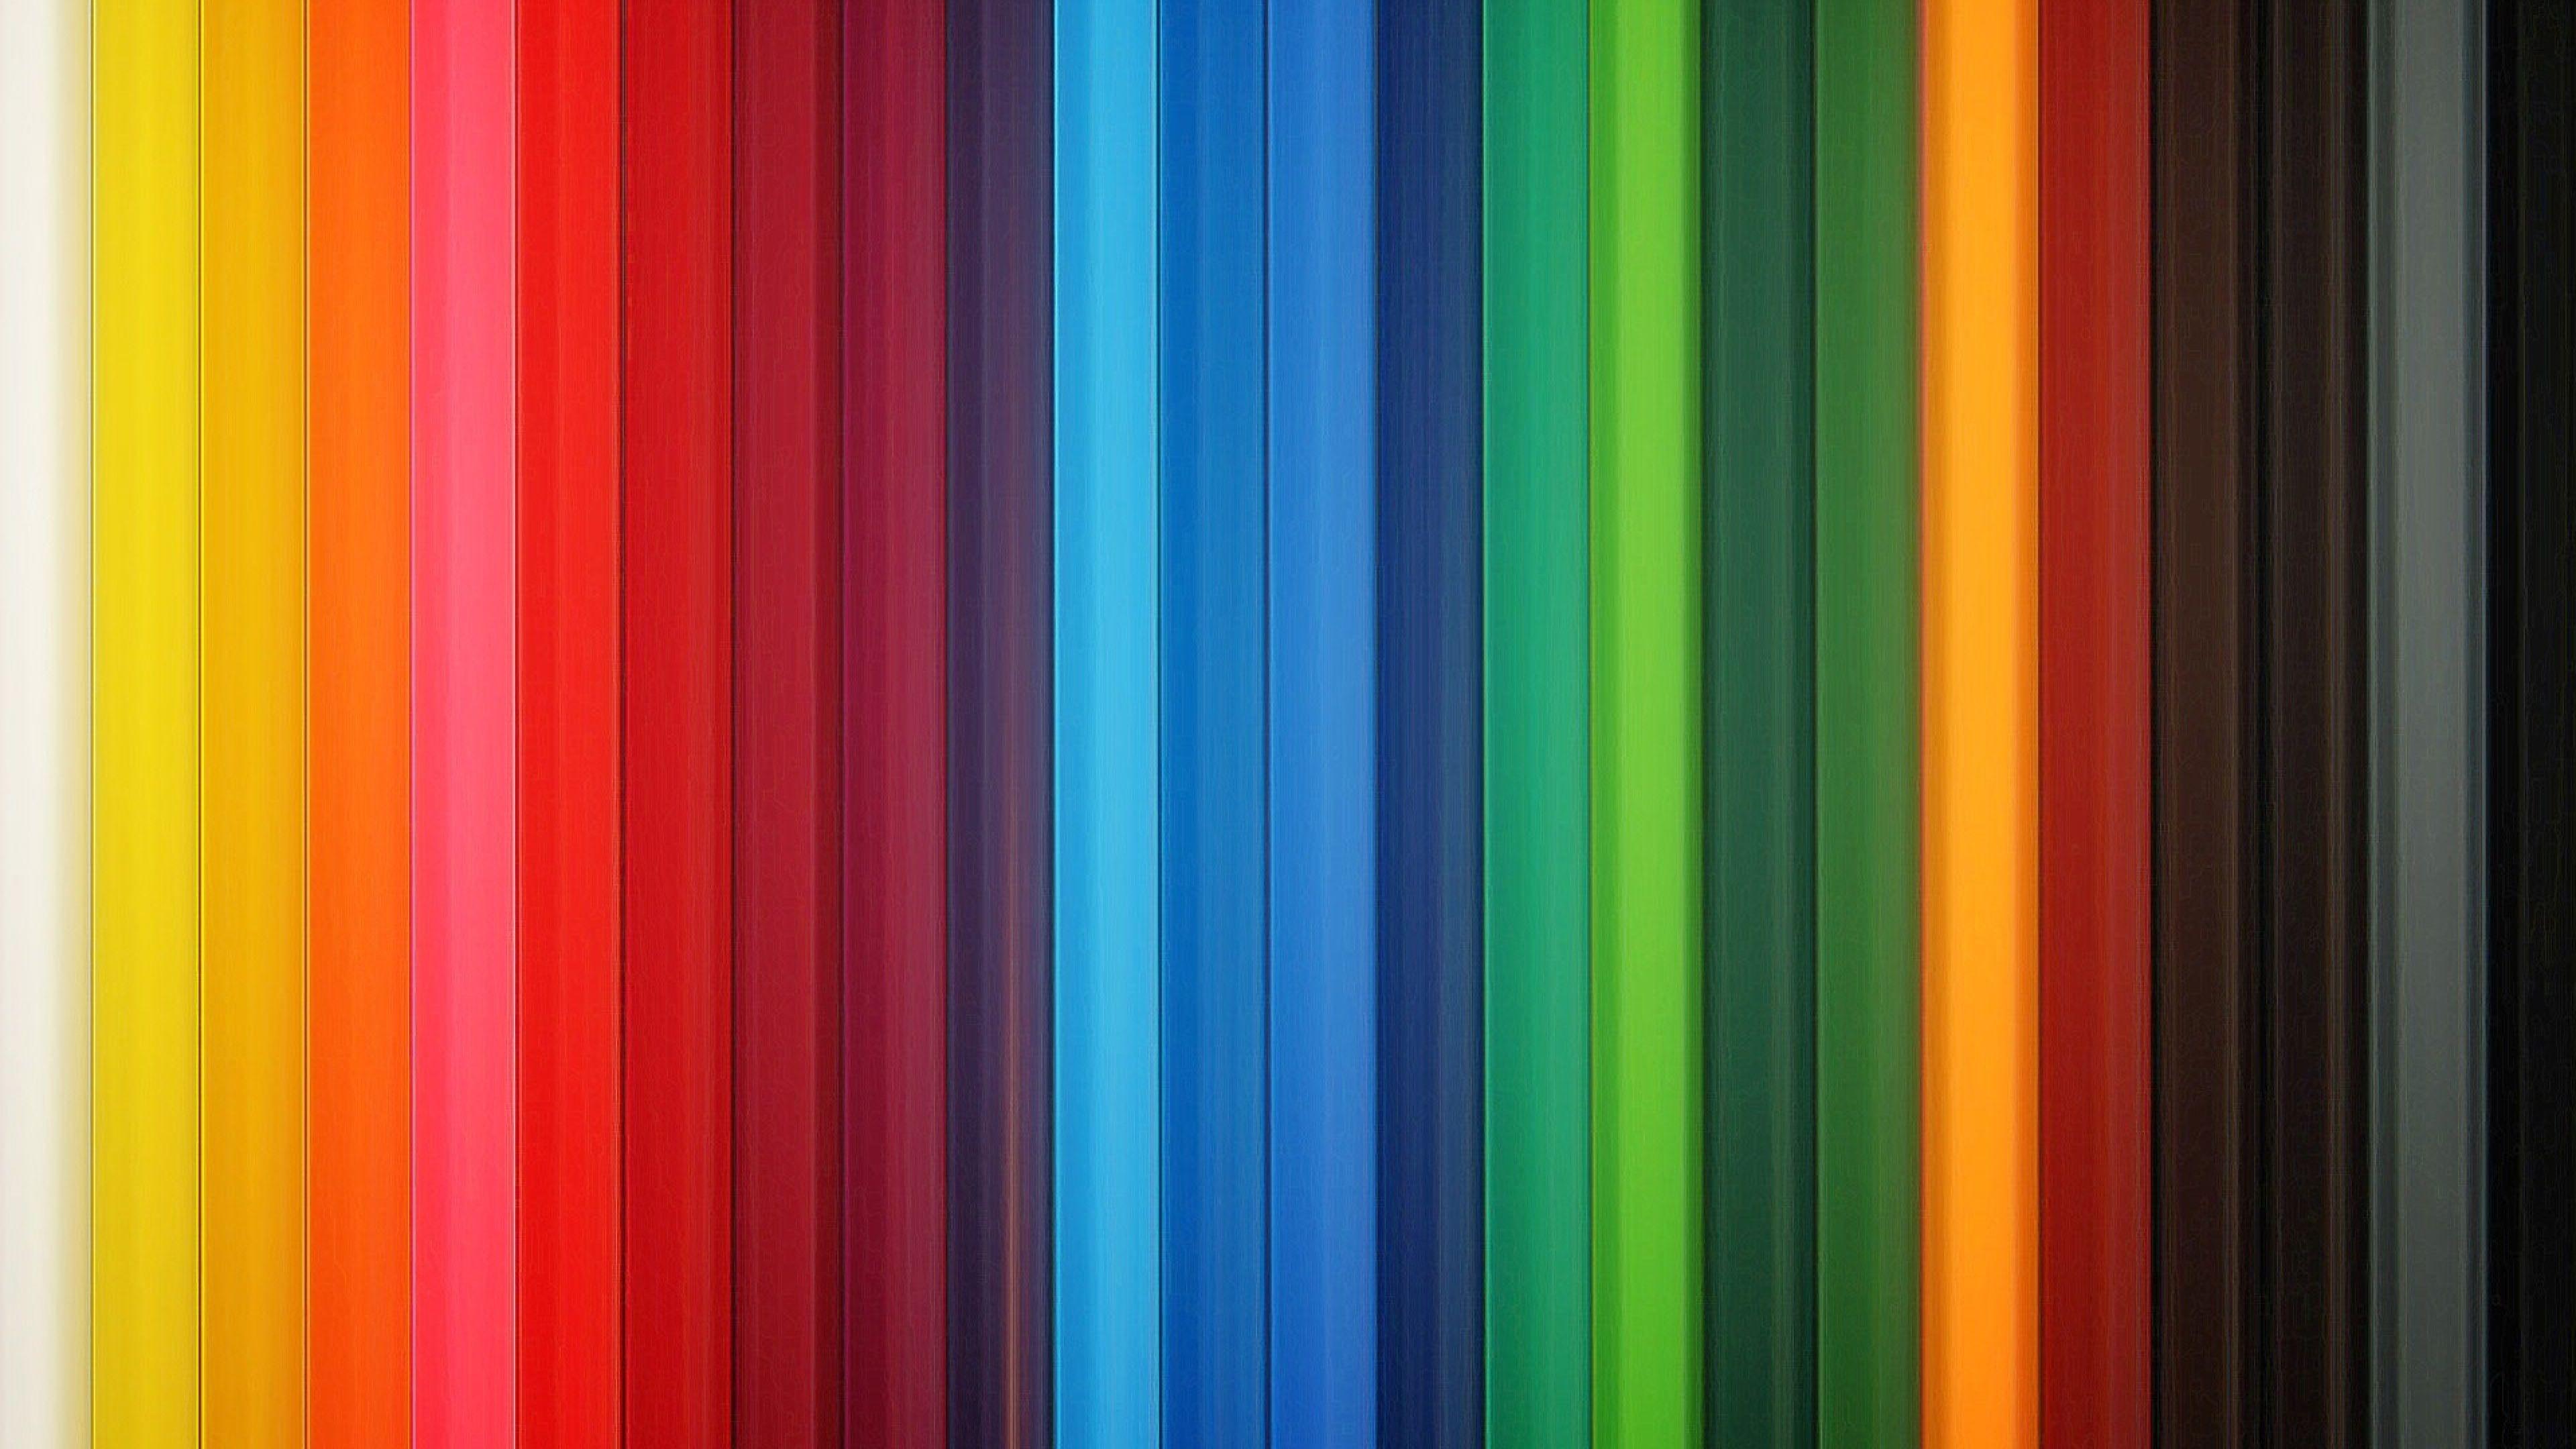 Colorful Desktop Backgrounds - Desktop Wallpaper Colorful - HD Wallpaper